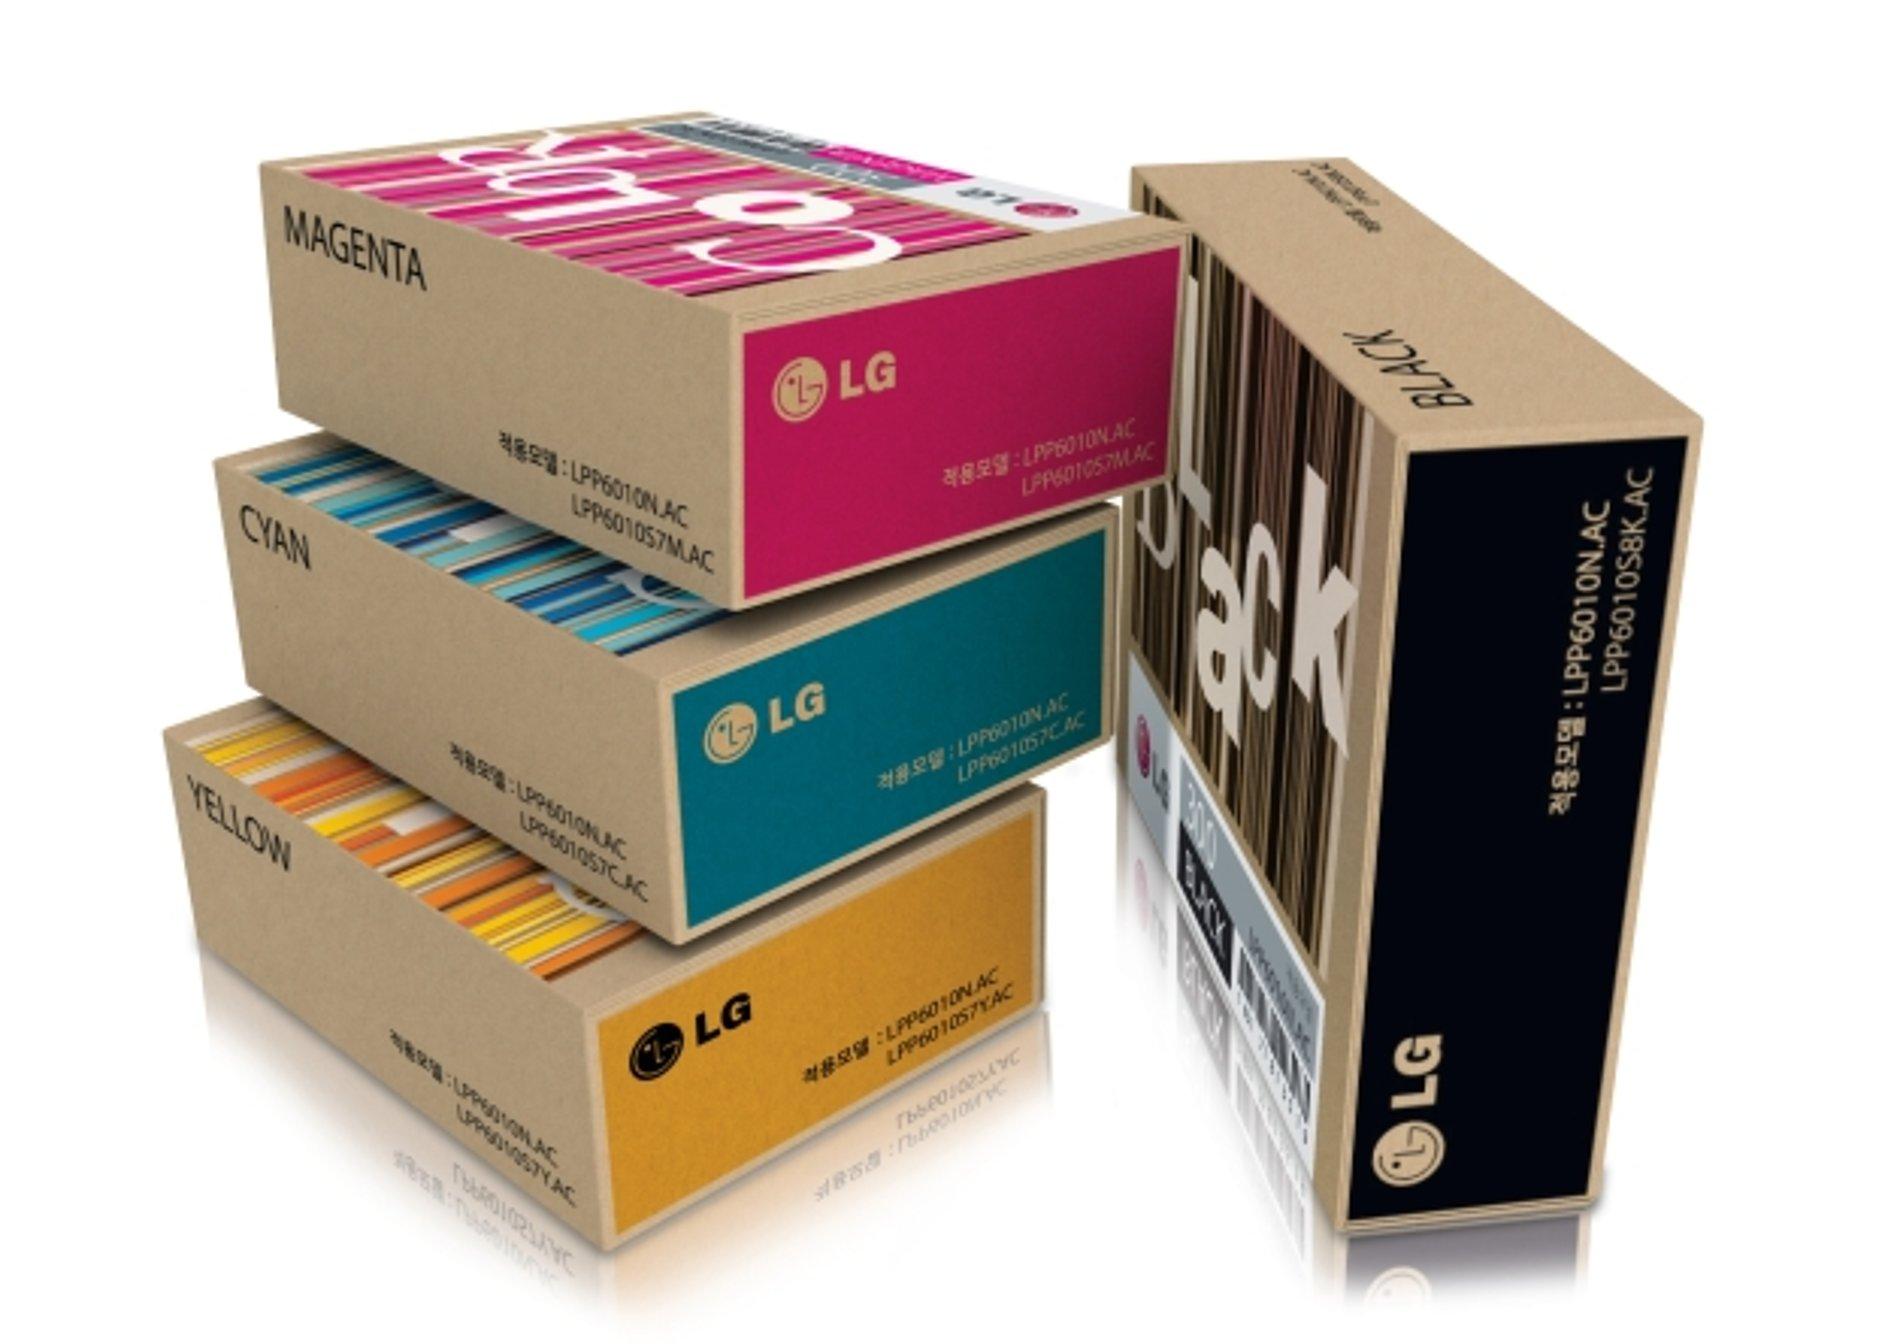 LPP6010N Printer Ink Cartridge Packaging   Red Dot Design Award